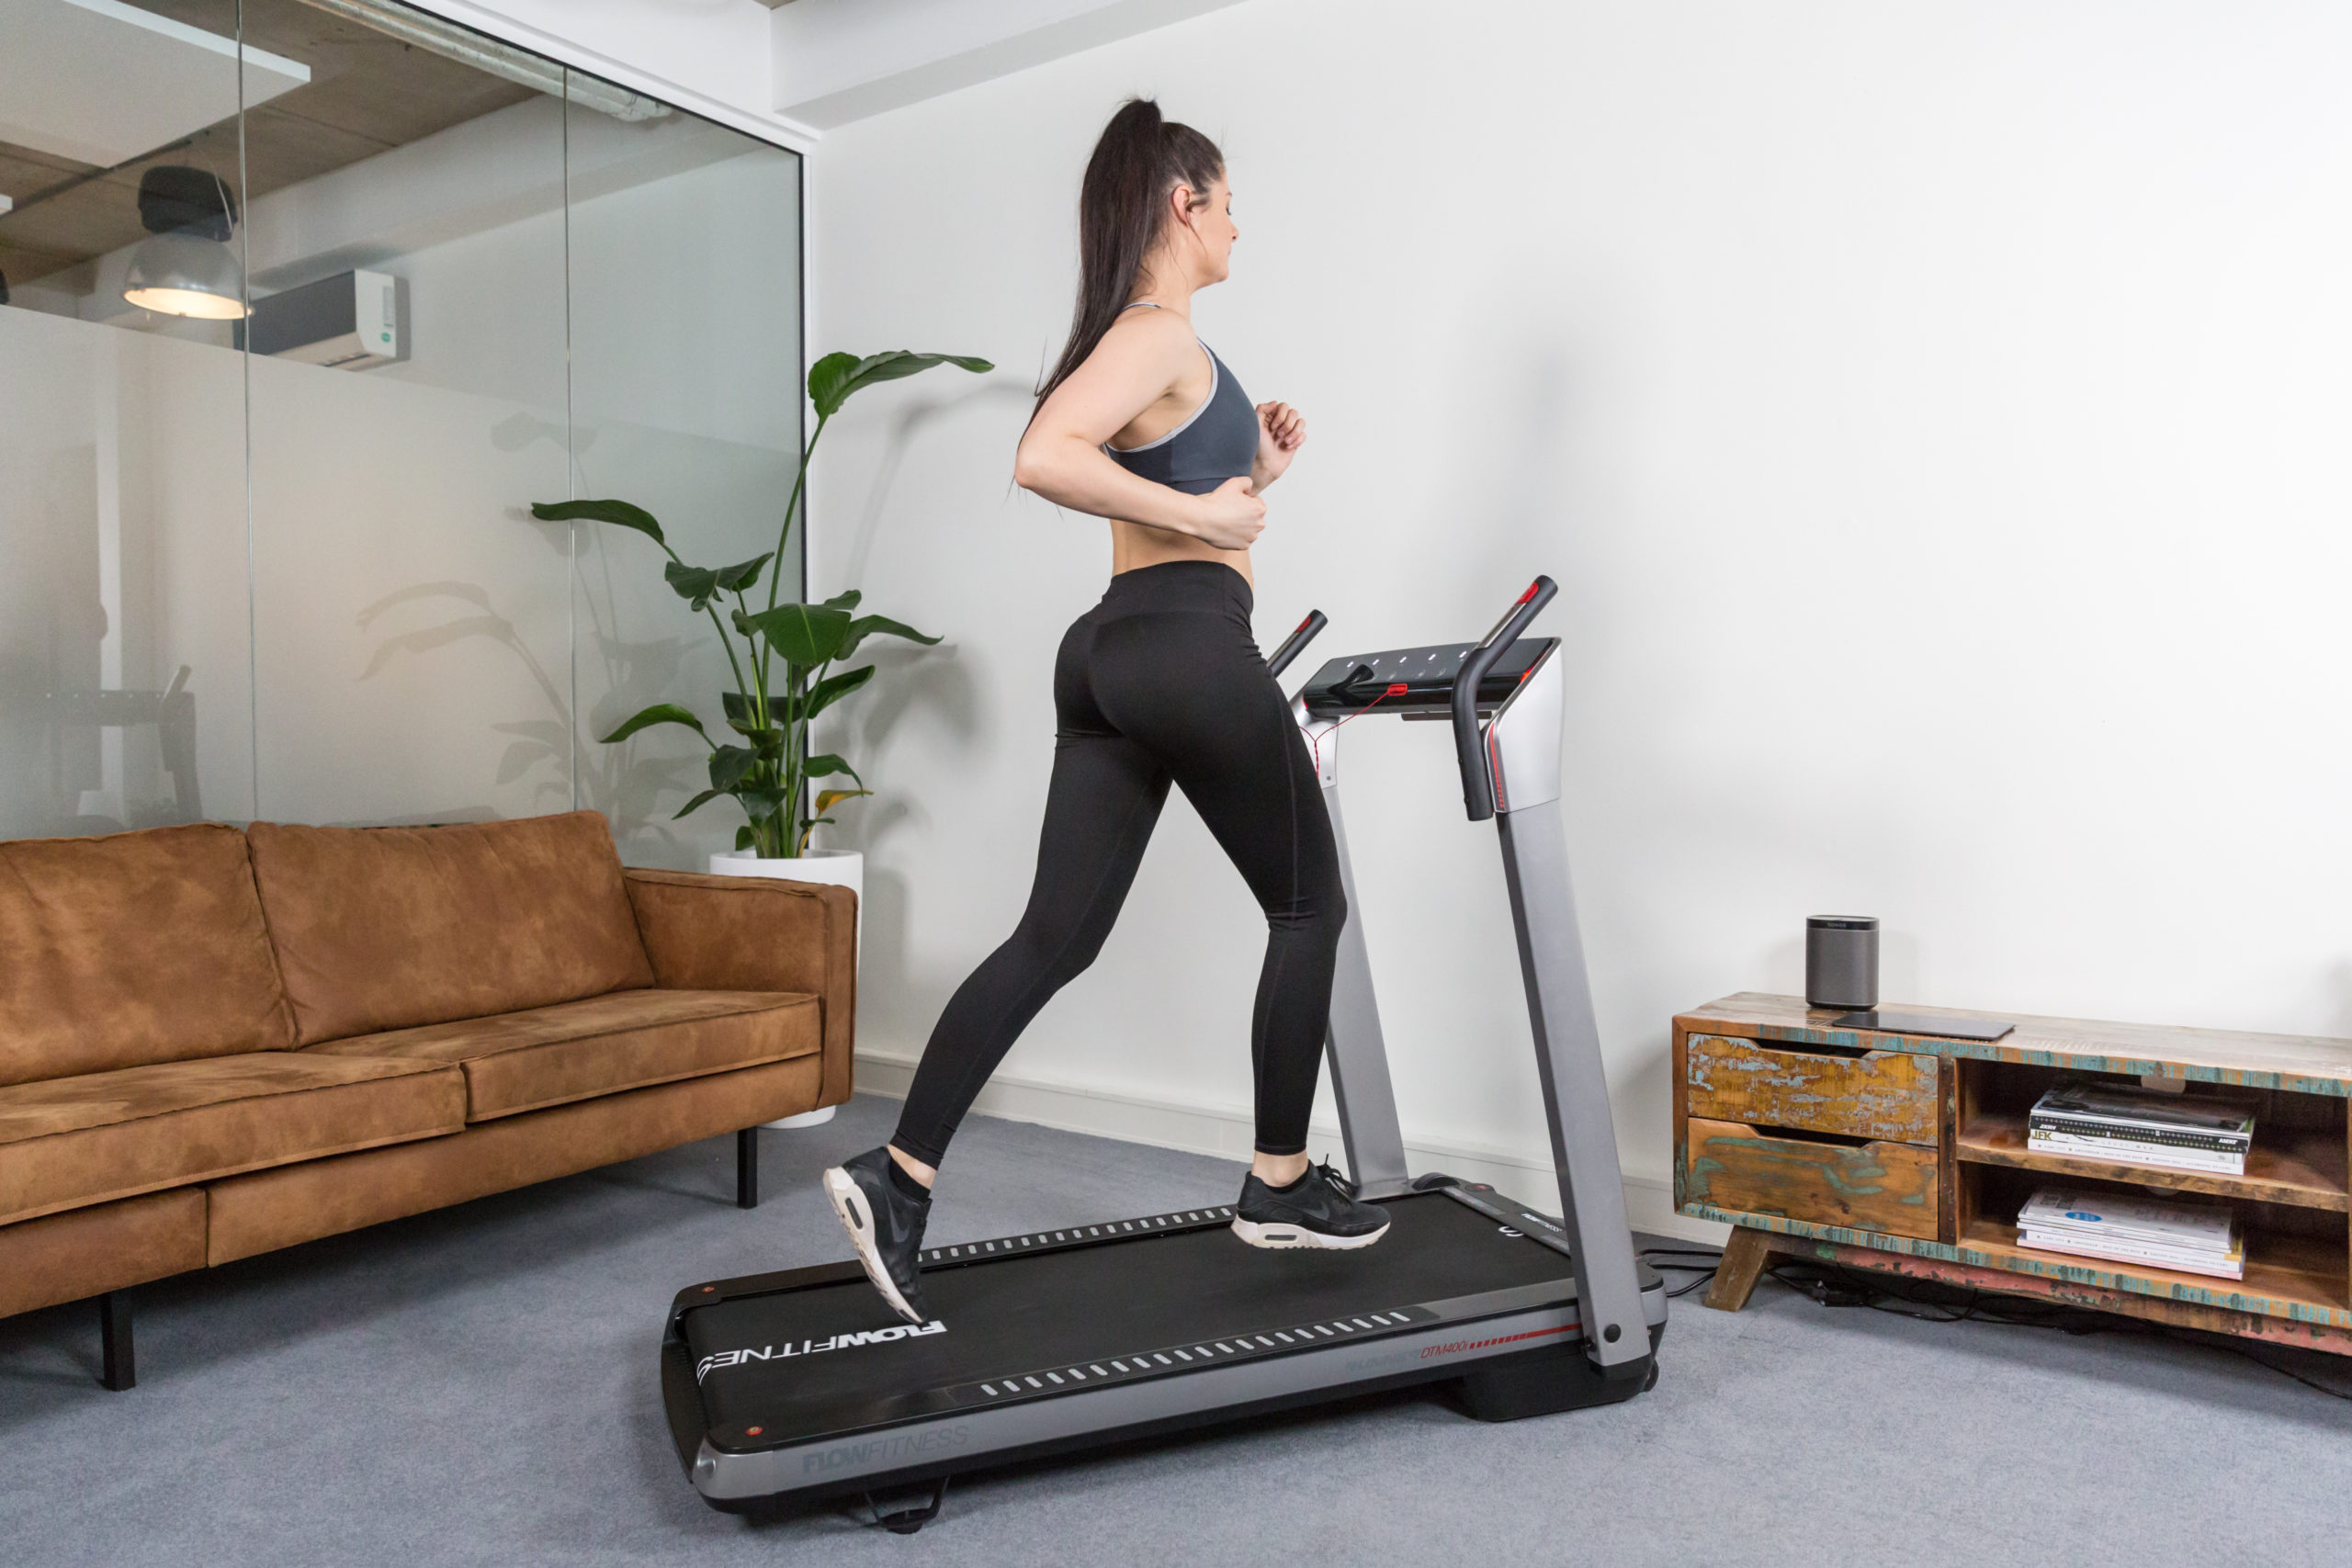 Flow Fitness Tabel Runner DTM400i loopband 10